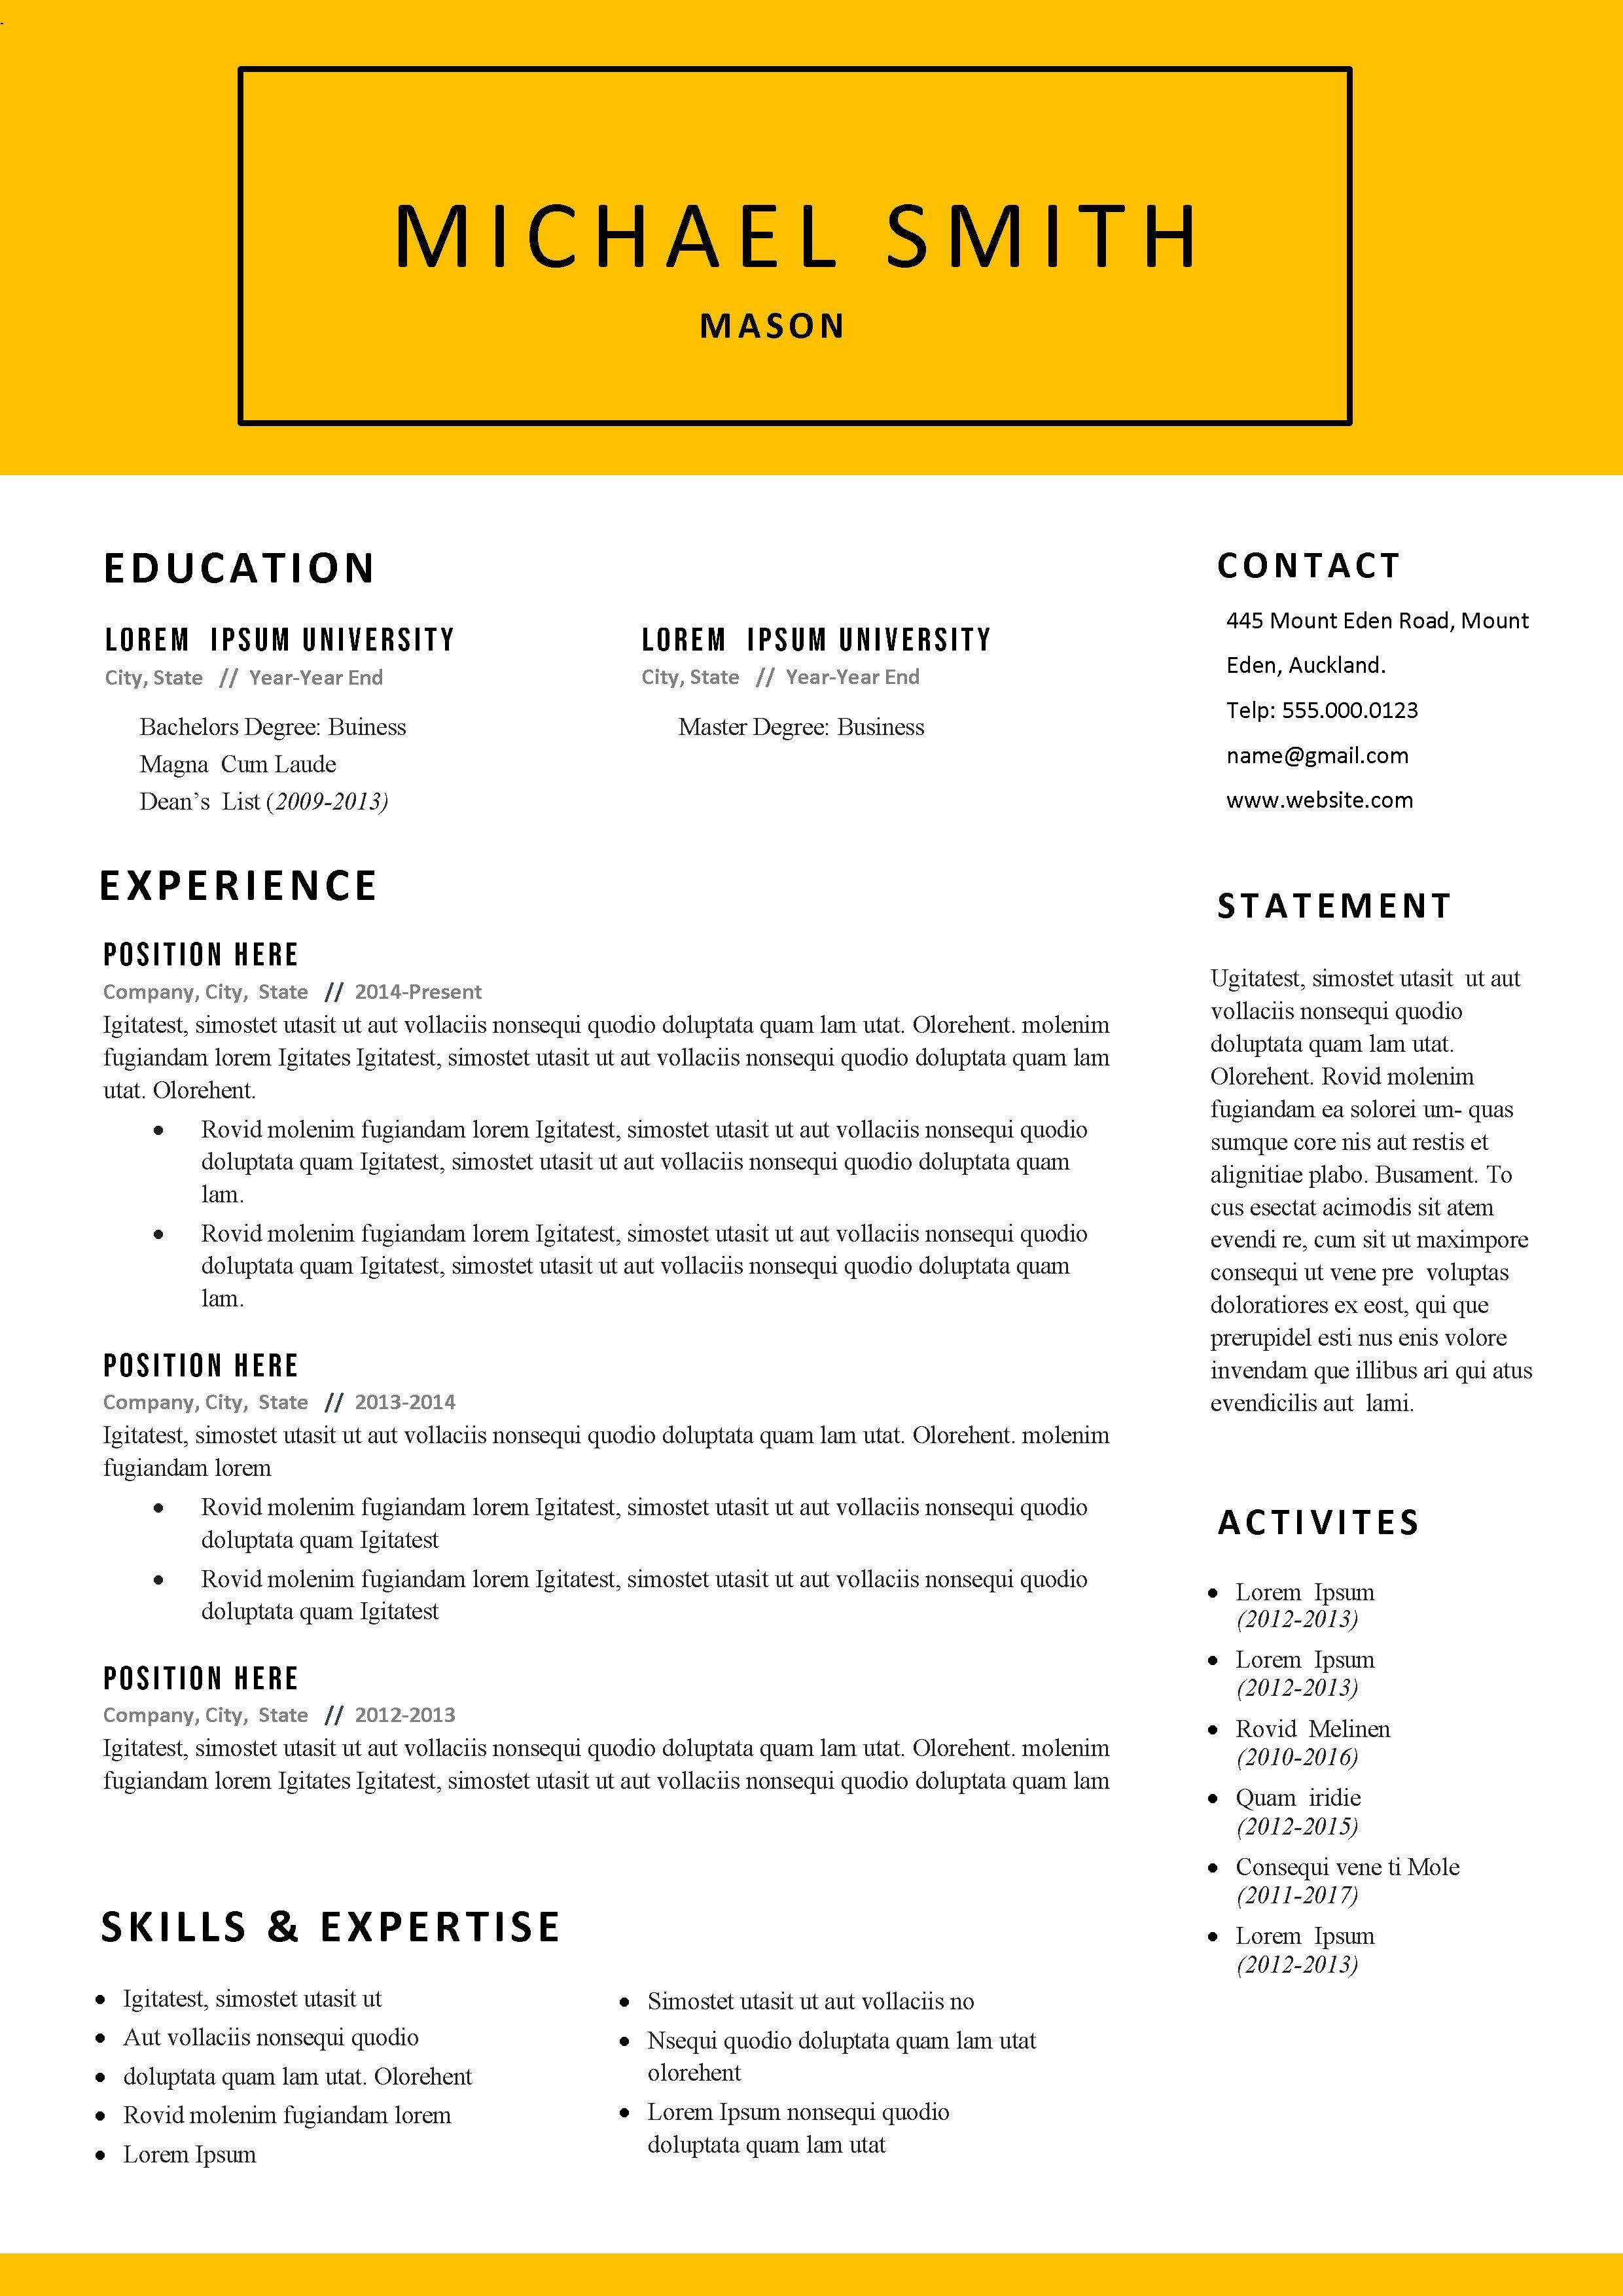 Free Mason Cv Resume Template Resume Template Resume Template Free Cv Resume Template